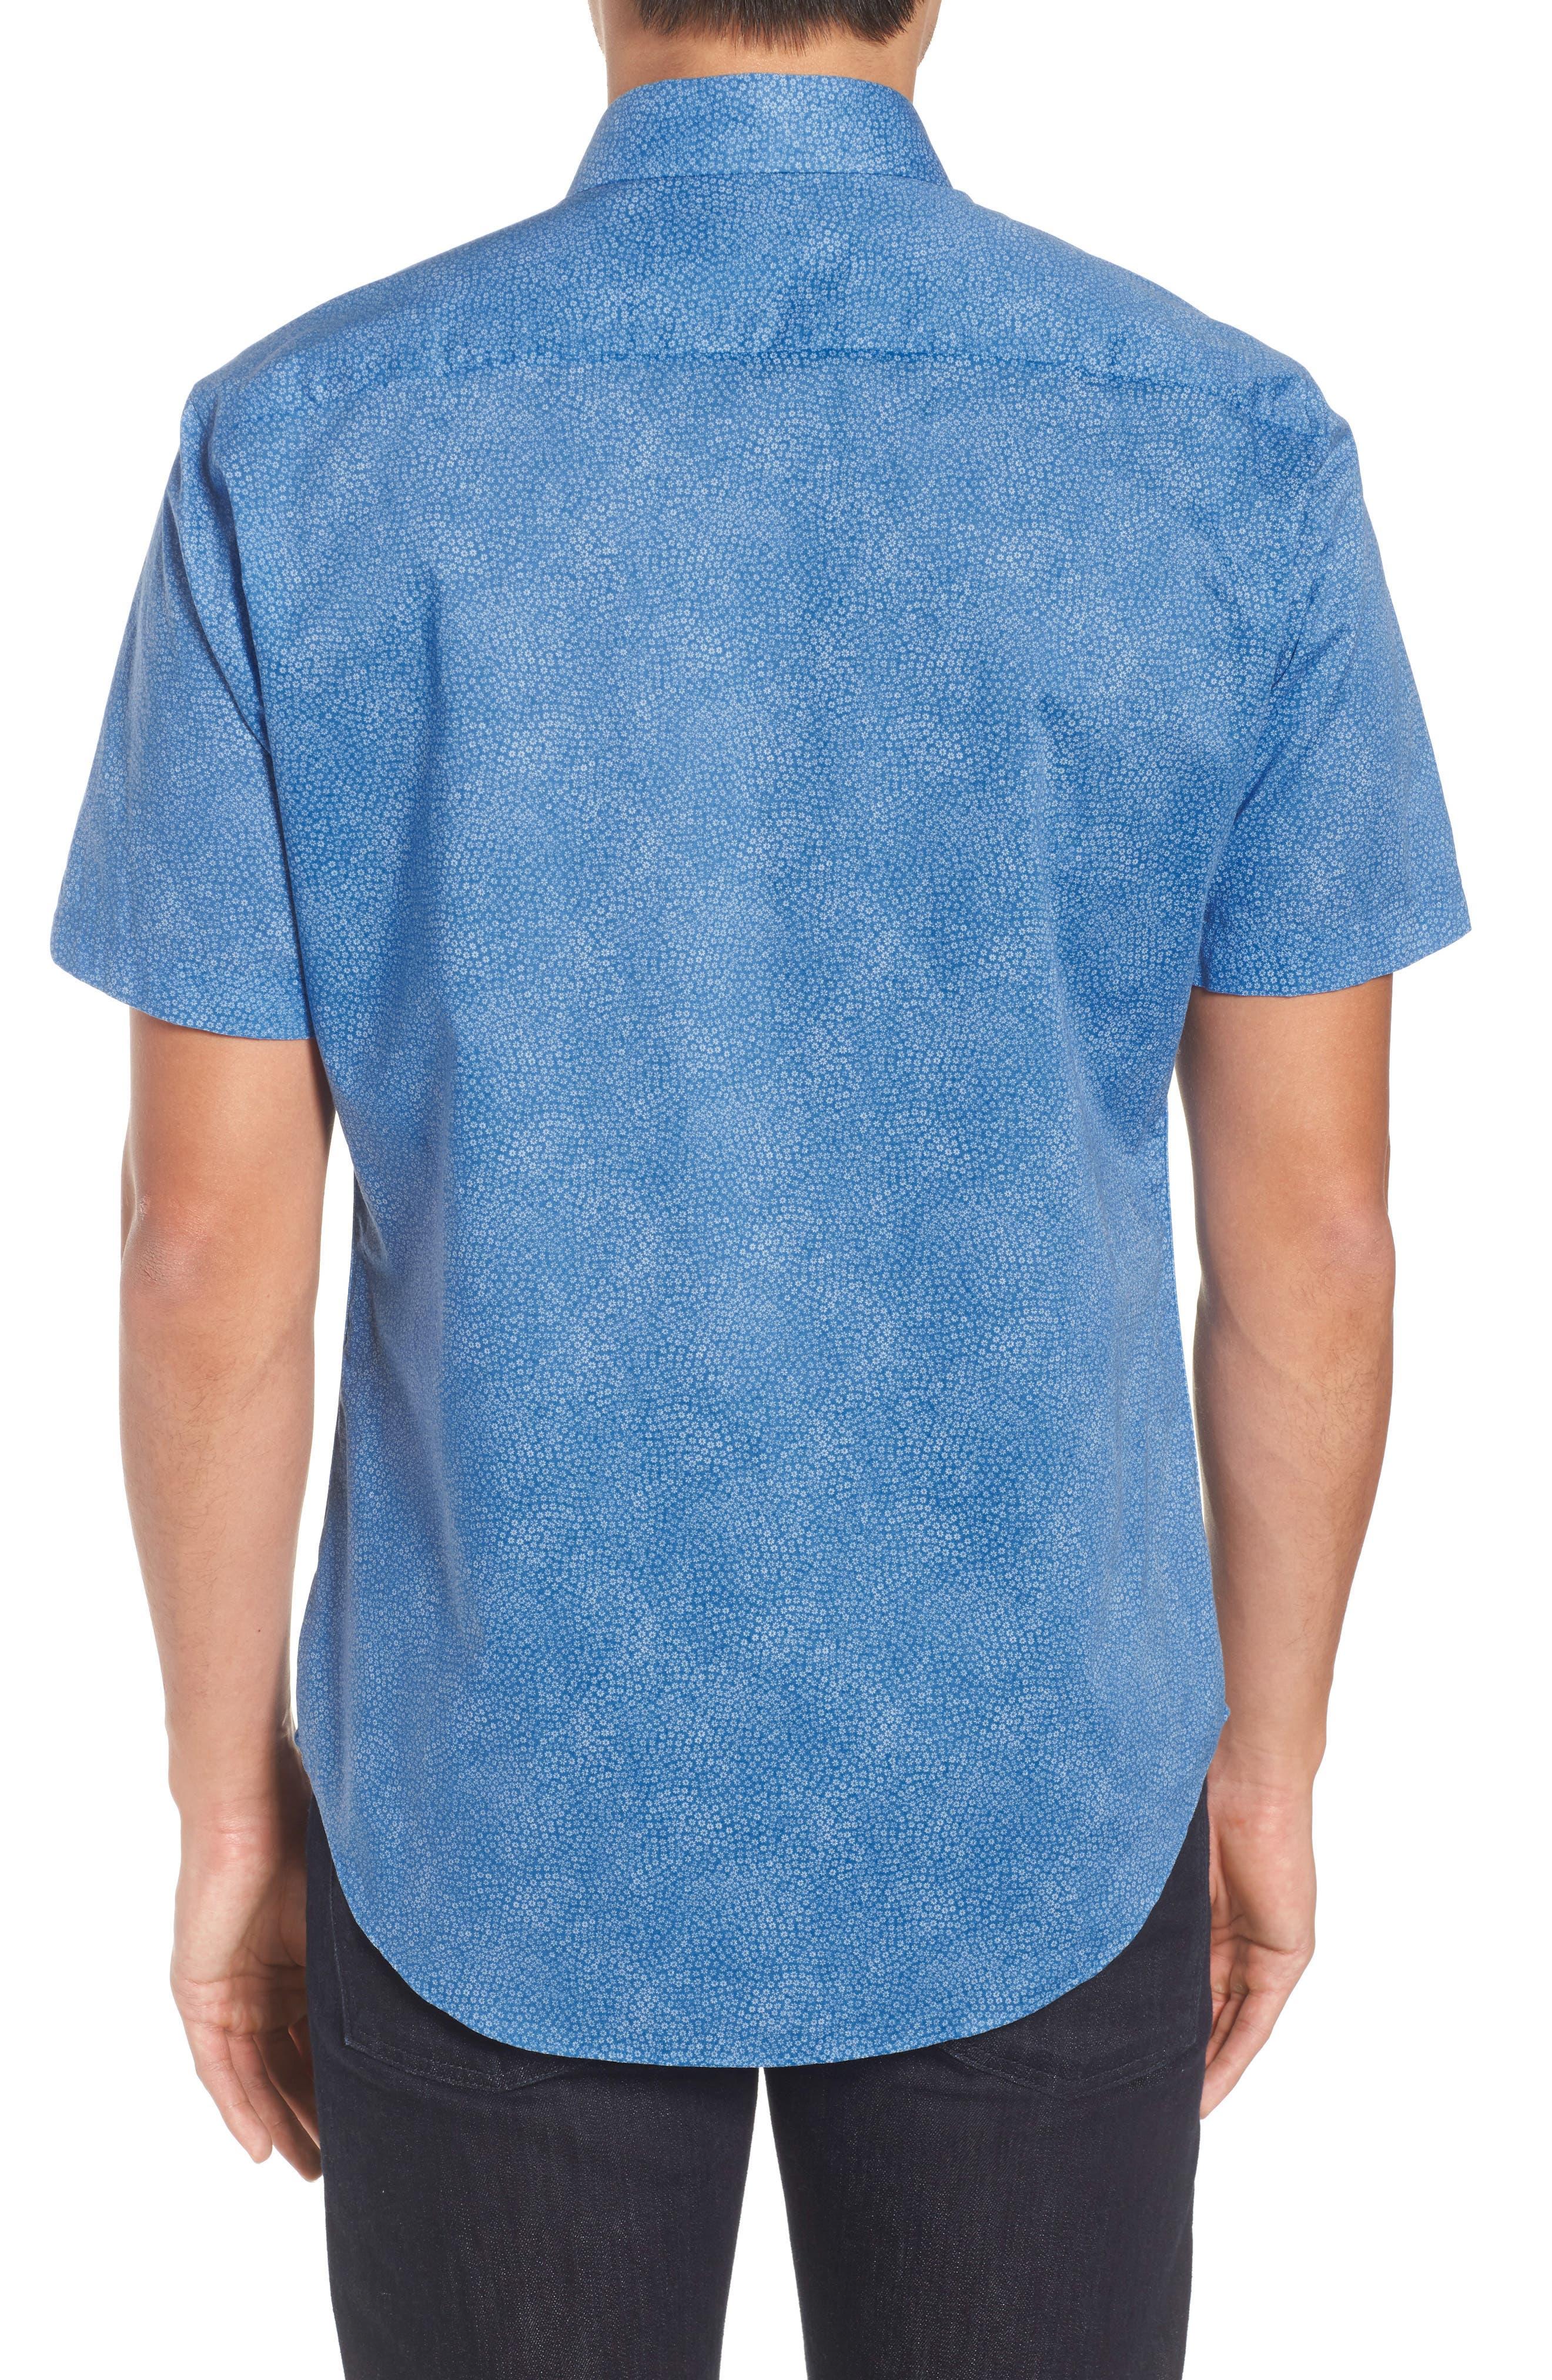 Siguenza Floral Short Sleeve Sport Shirt,                             Alternate thumbnail 2, color,                             400